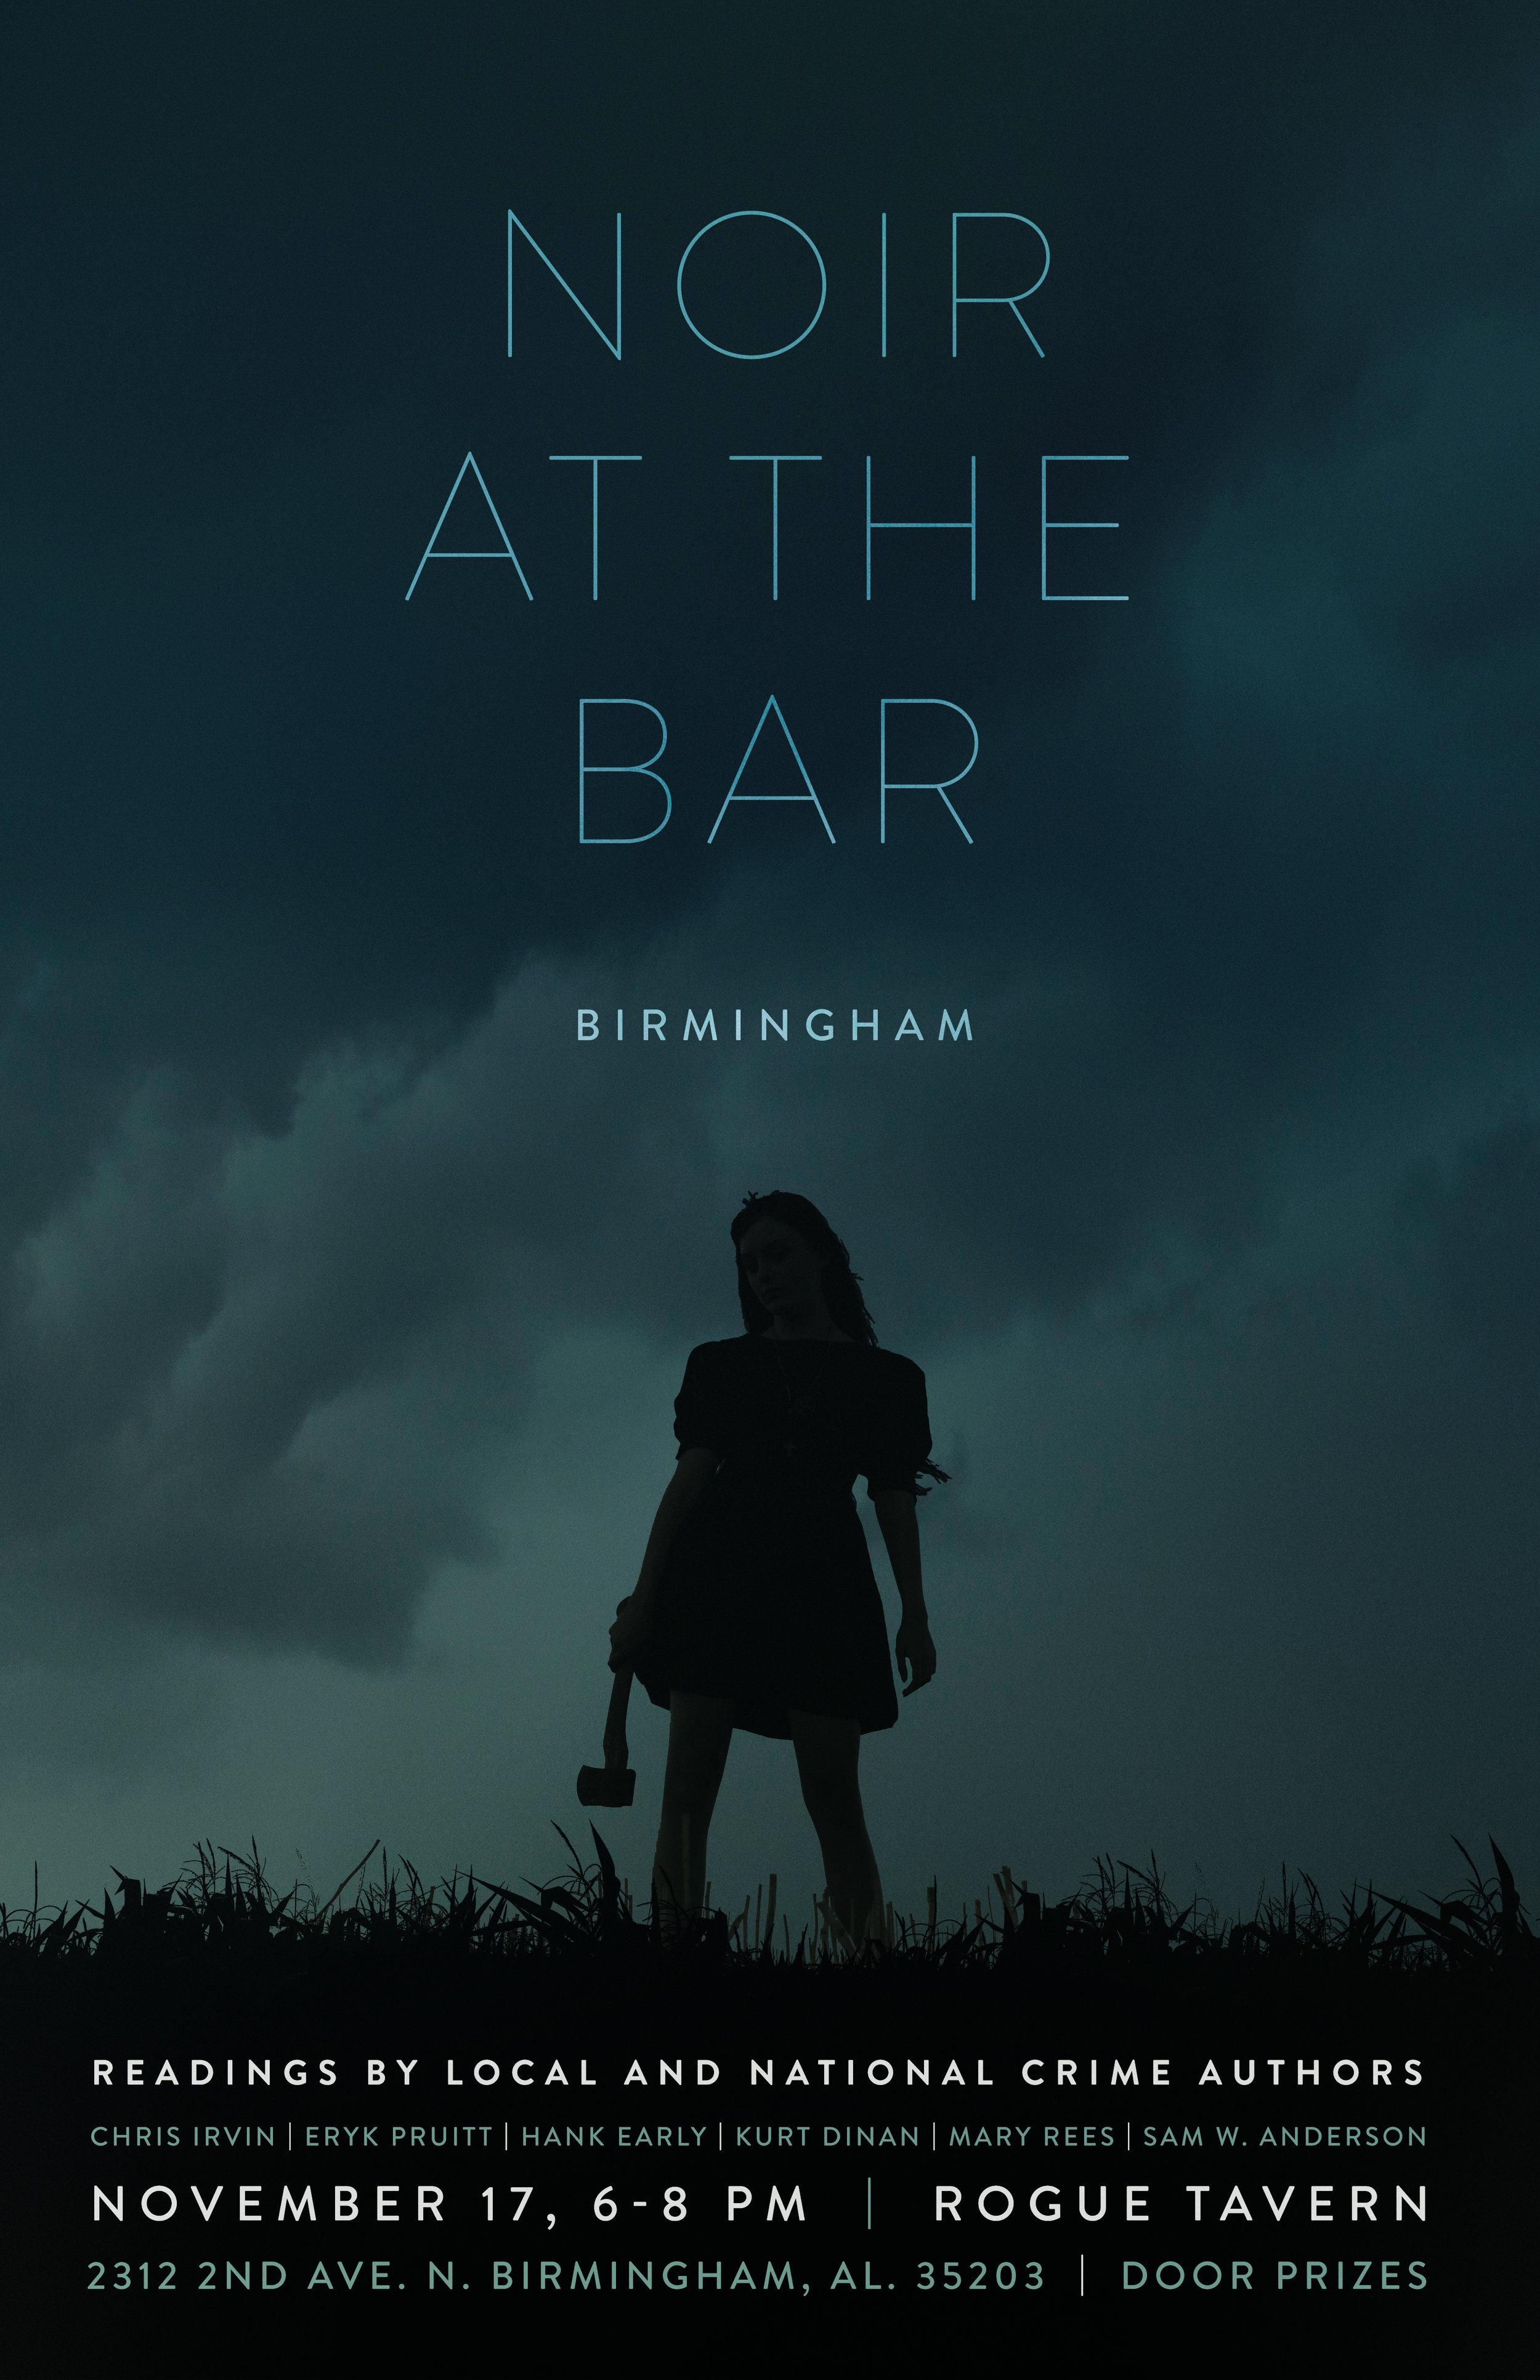 noir at the bar alt 2.jpg